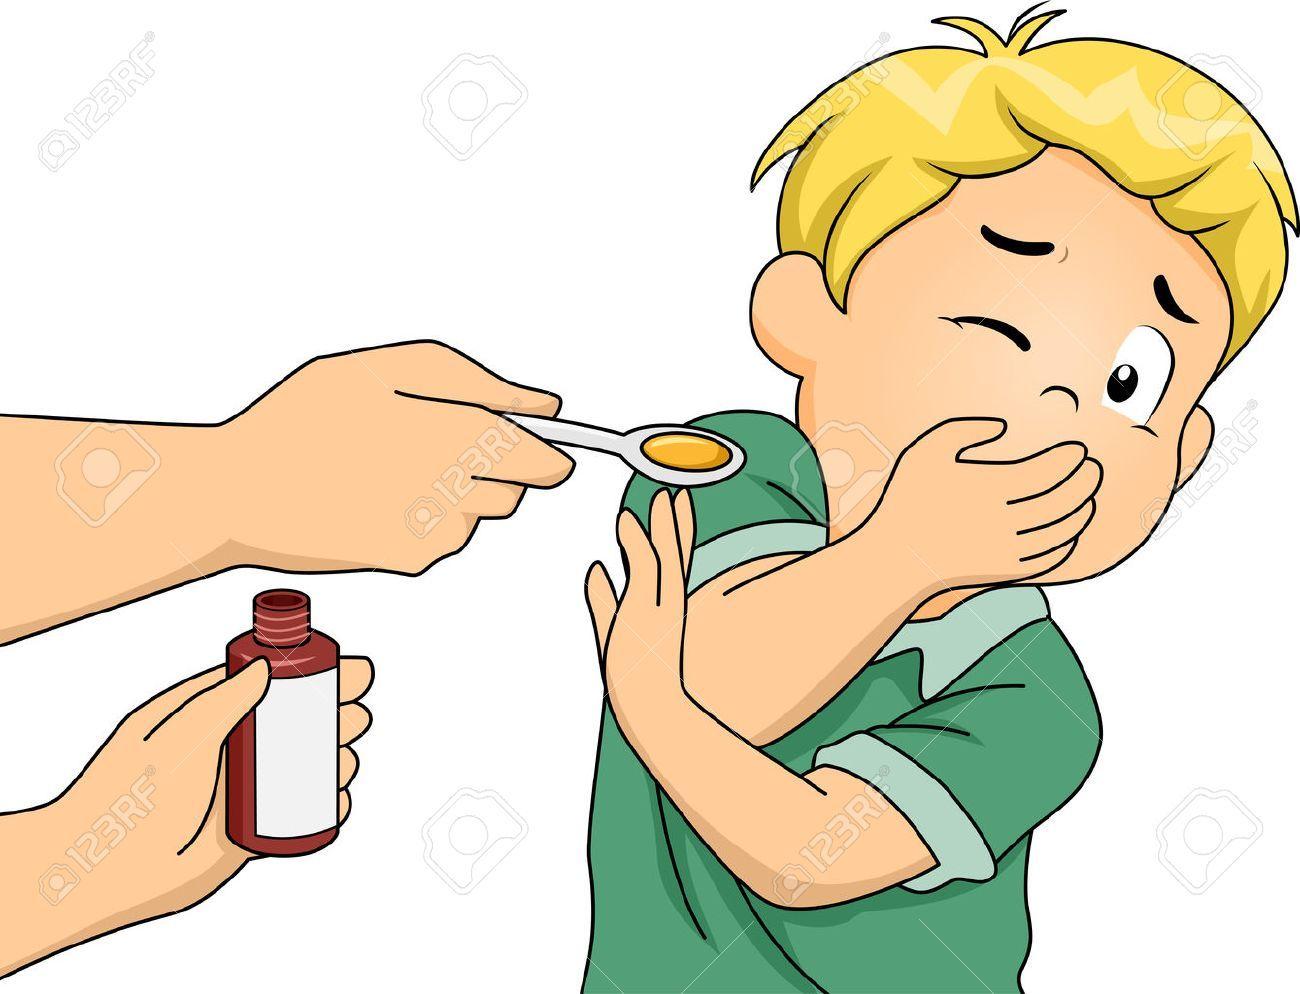 Taking medicine clipart png transparent download Taking medication clipart 7 » Clipart Portal png transparent download